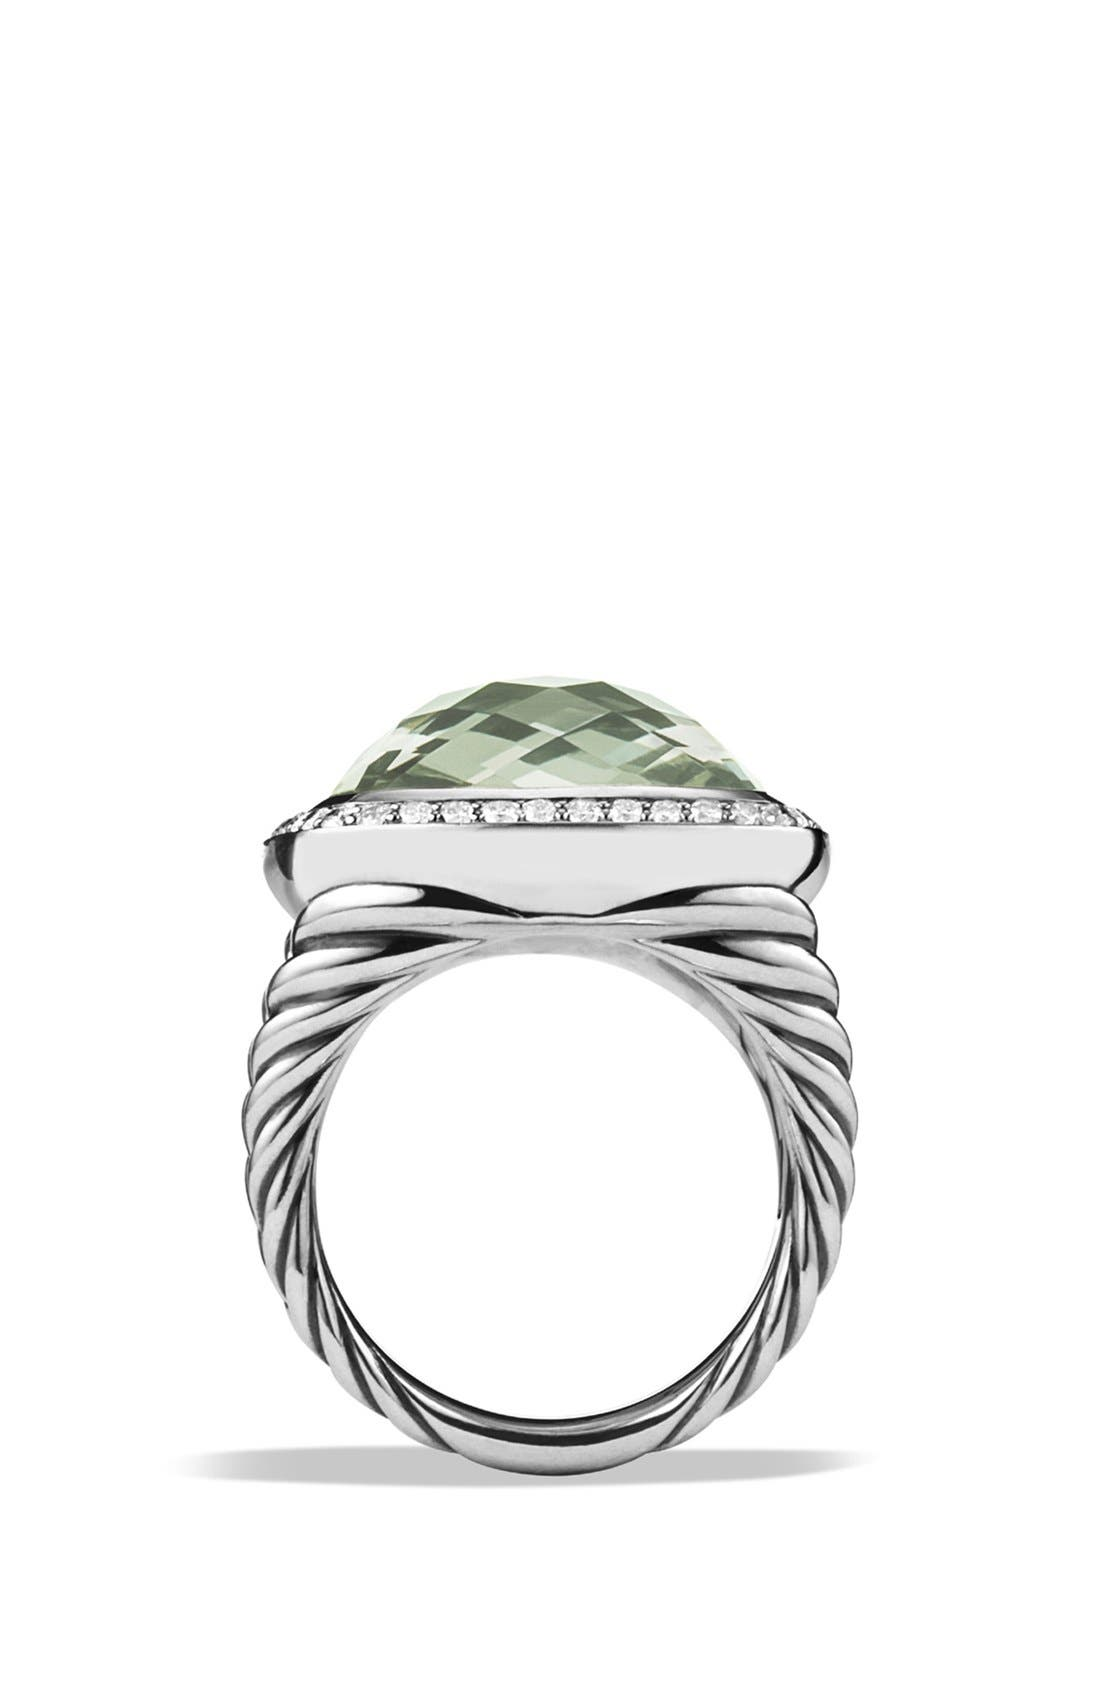 'Albion' Ring with Diamonds,                             Alternate thumbnail 2, color,                             Prasiolite